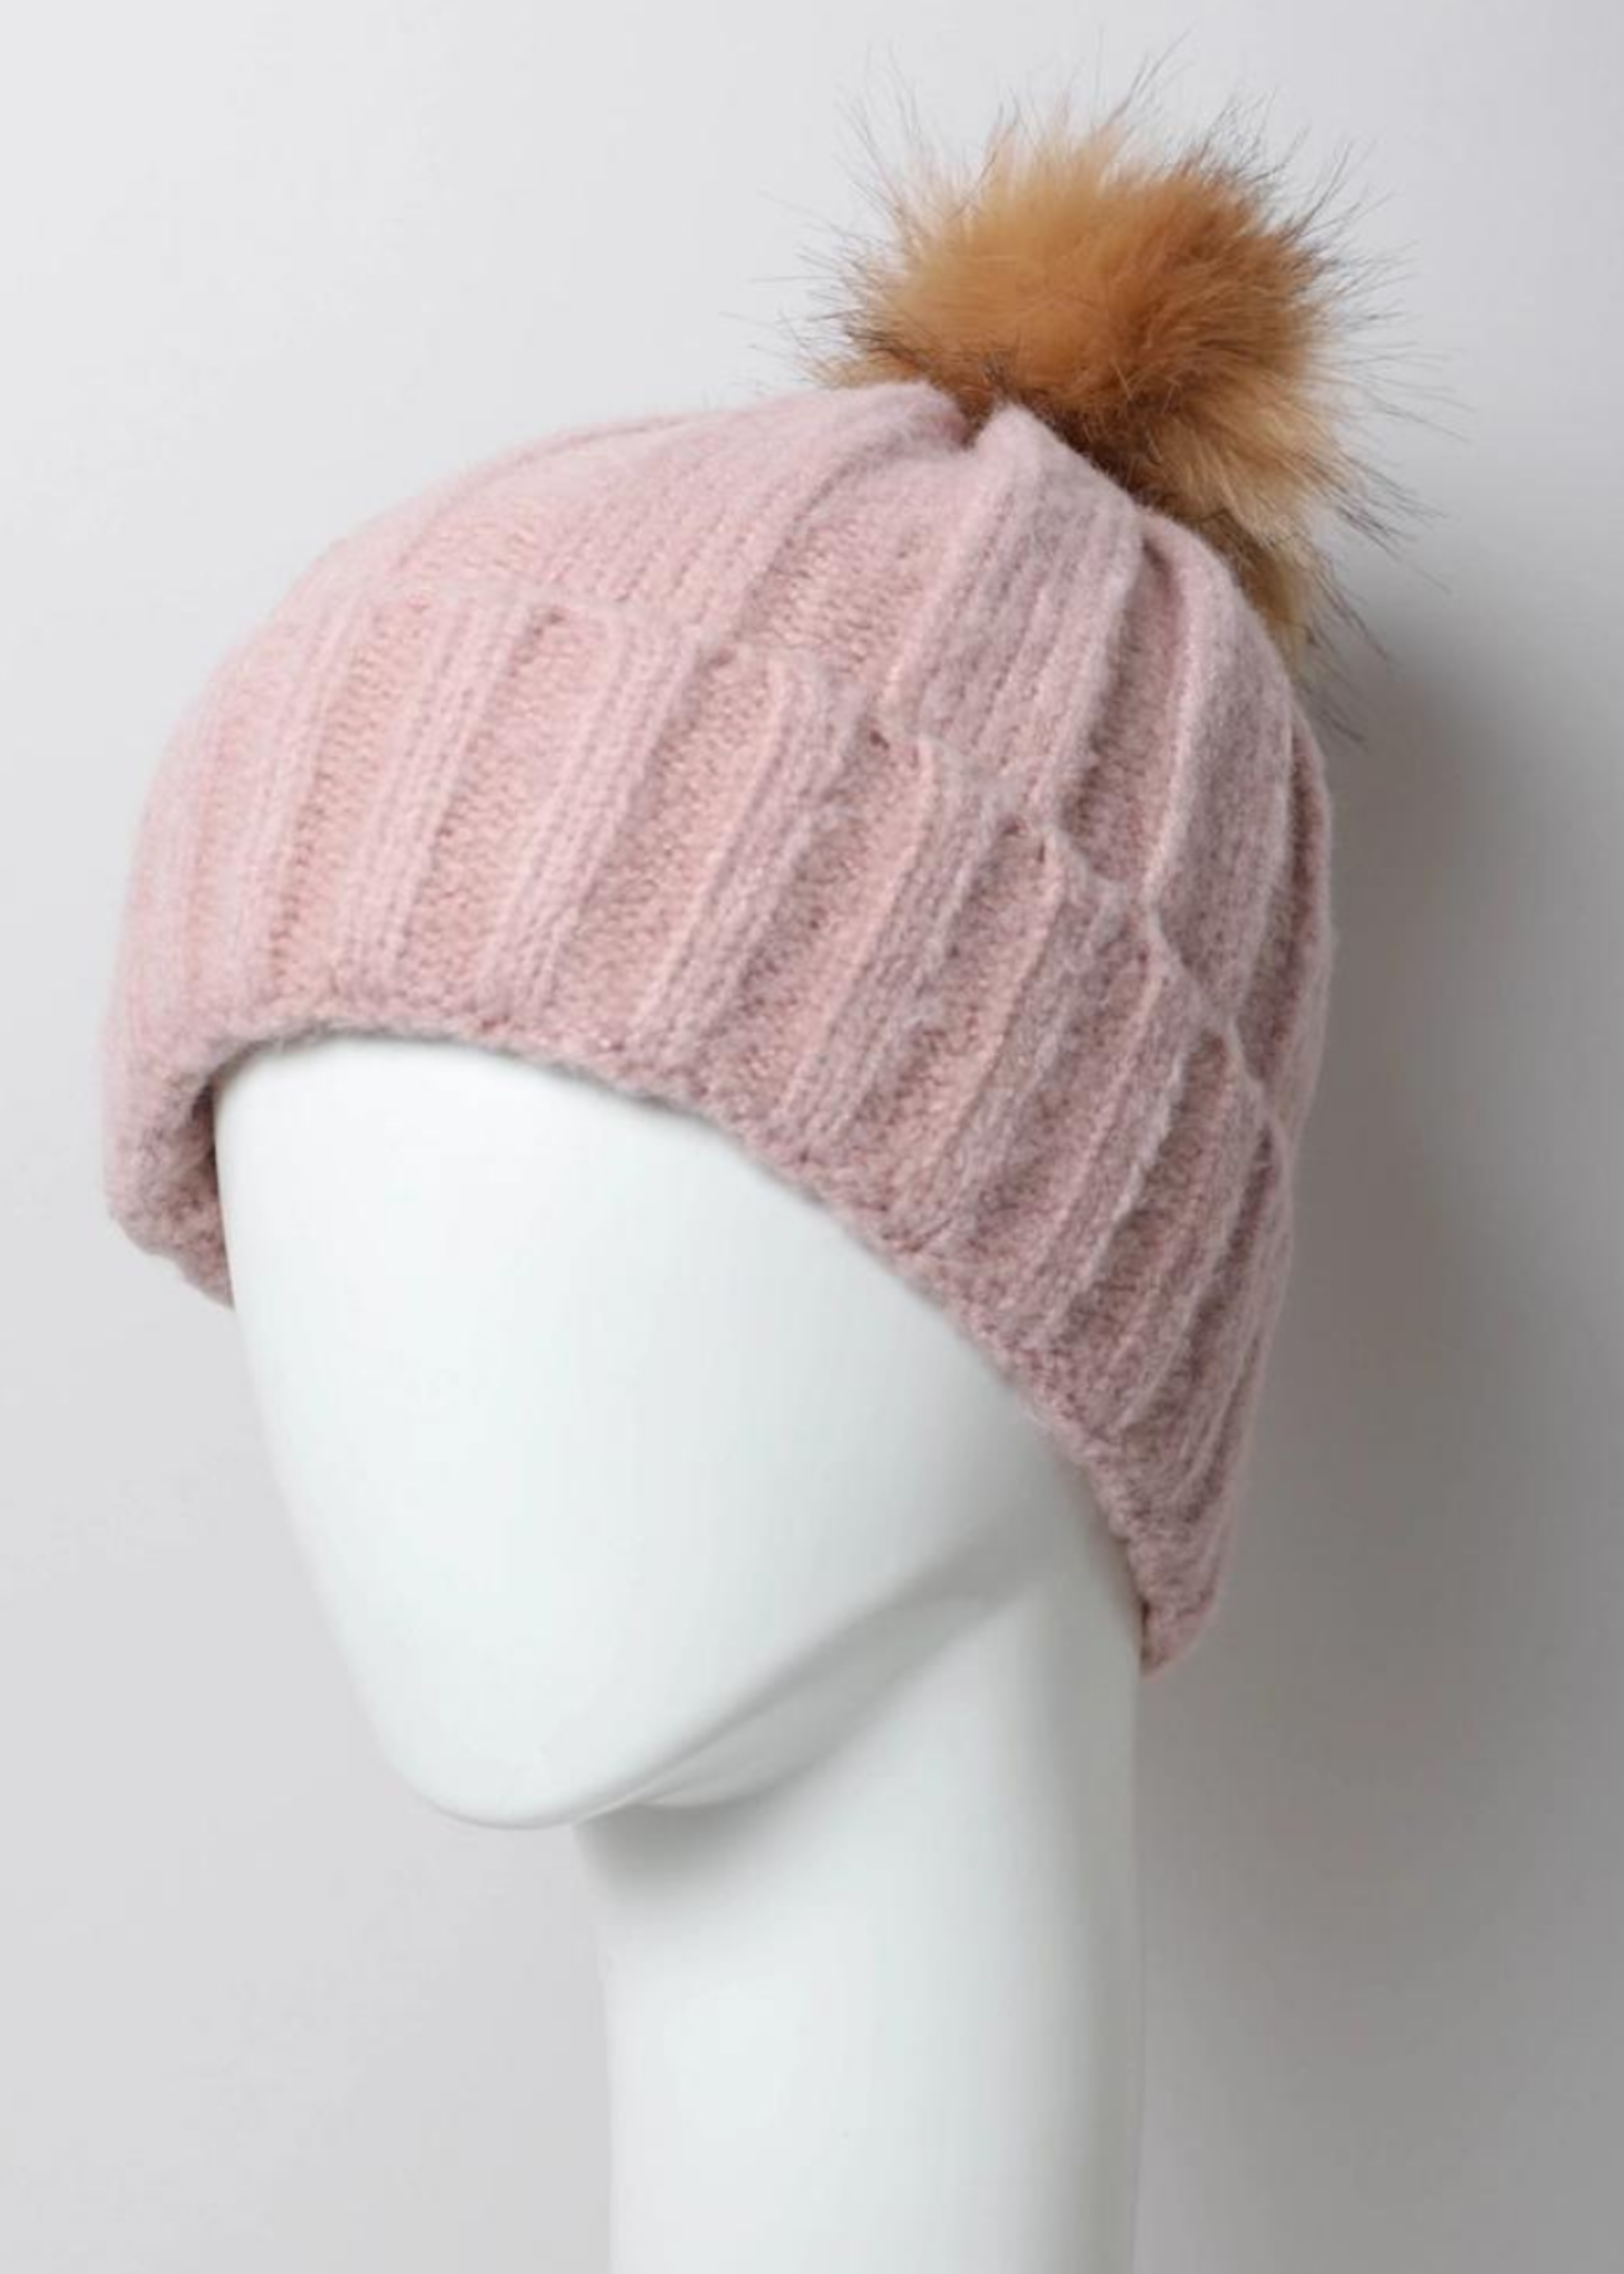 Leto Accessories Knit Pom Beanie Hat